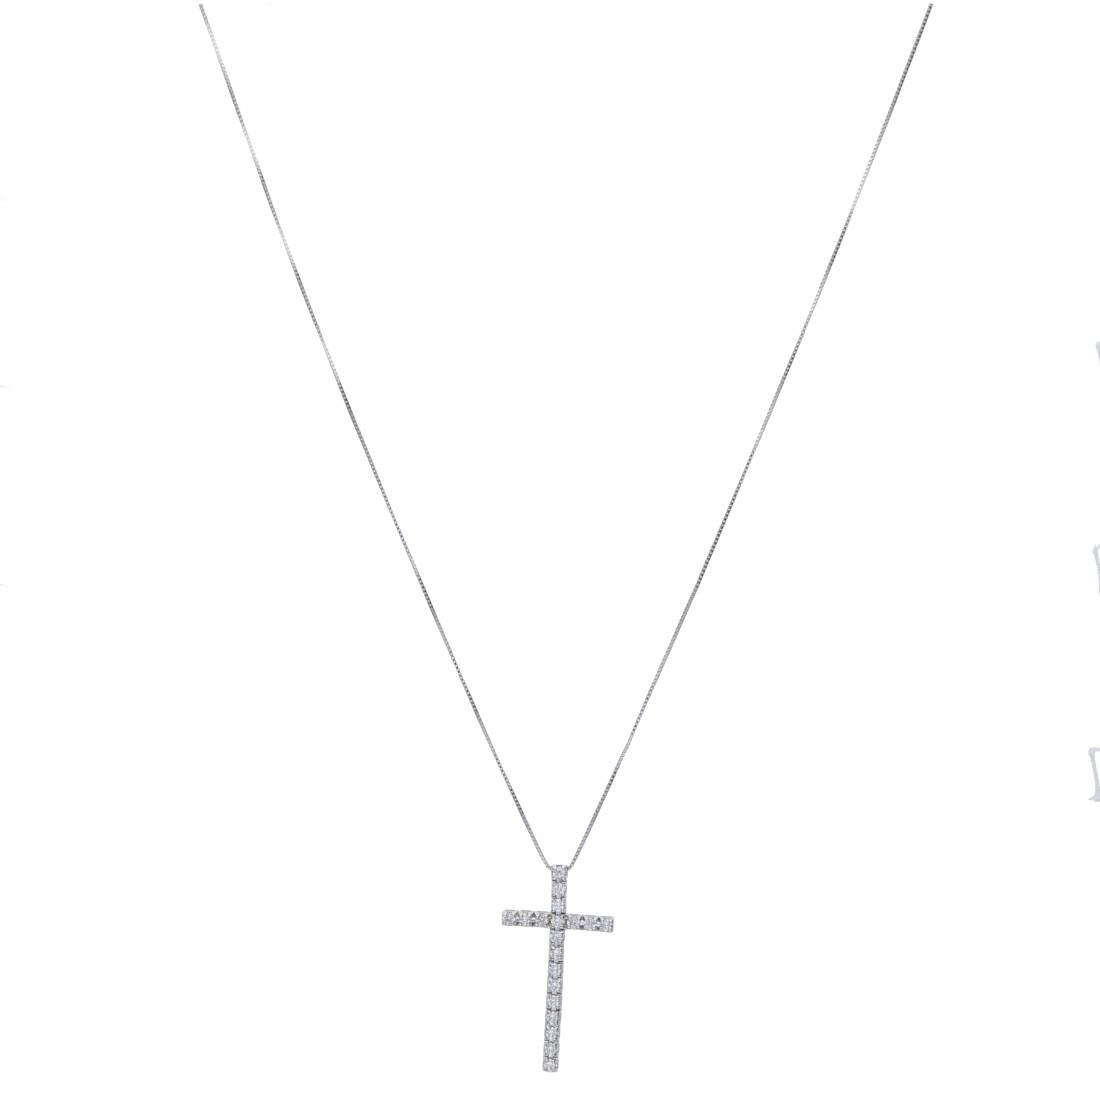 Collana croce con diamanti bianchi - ALFIERI & ST. JOHN